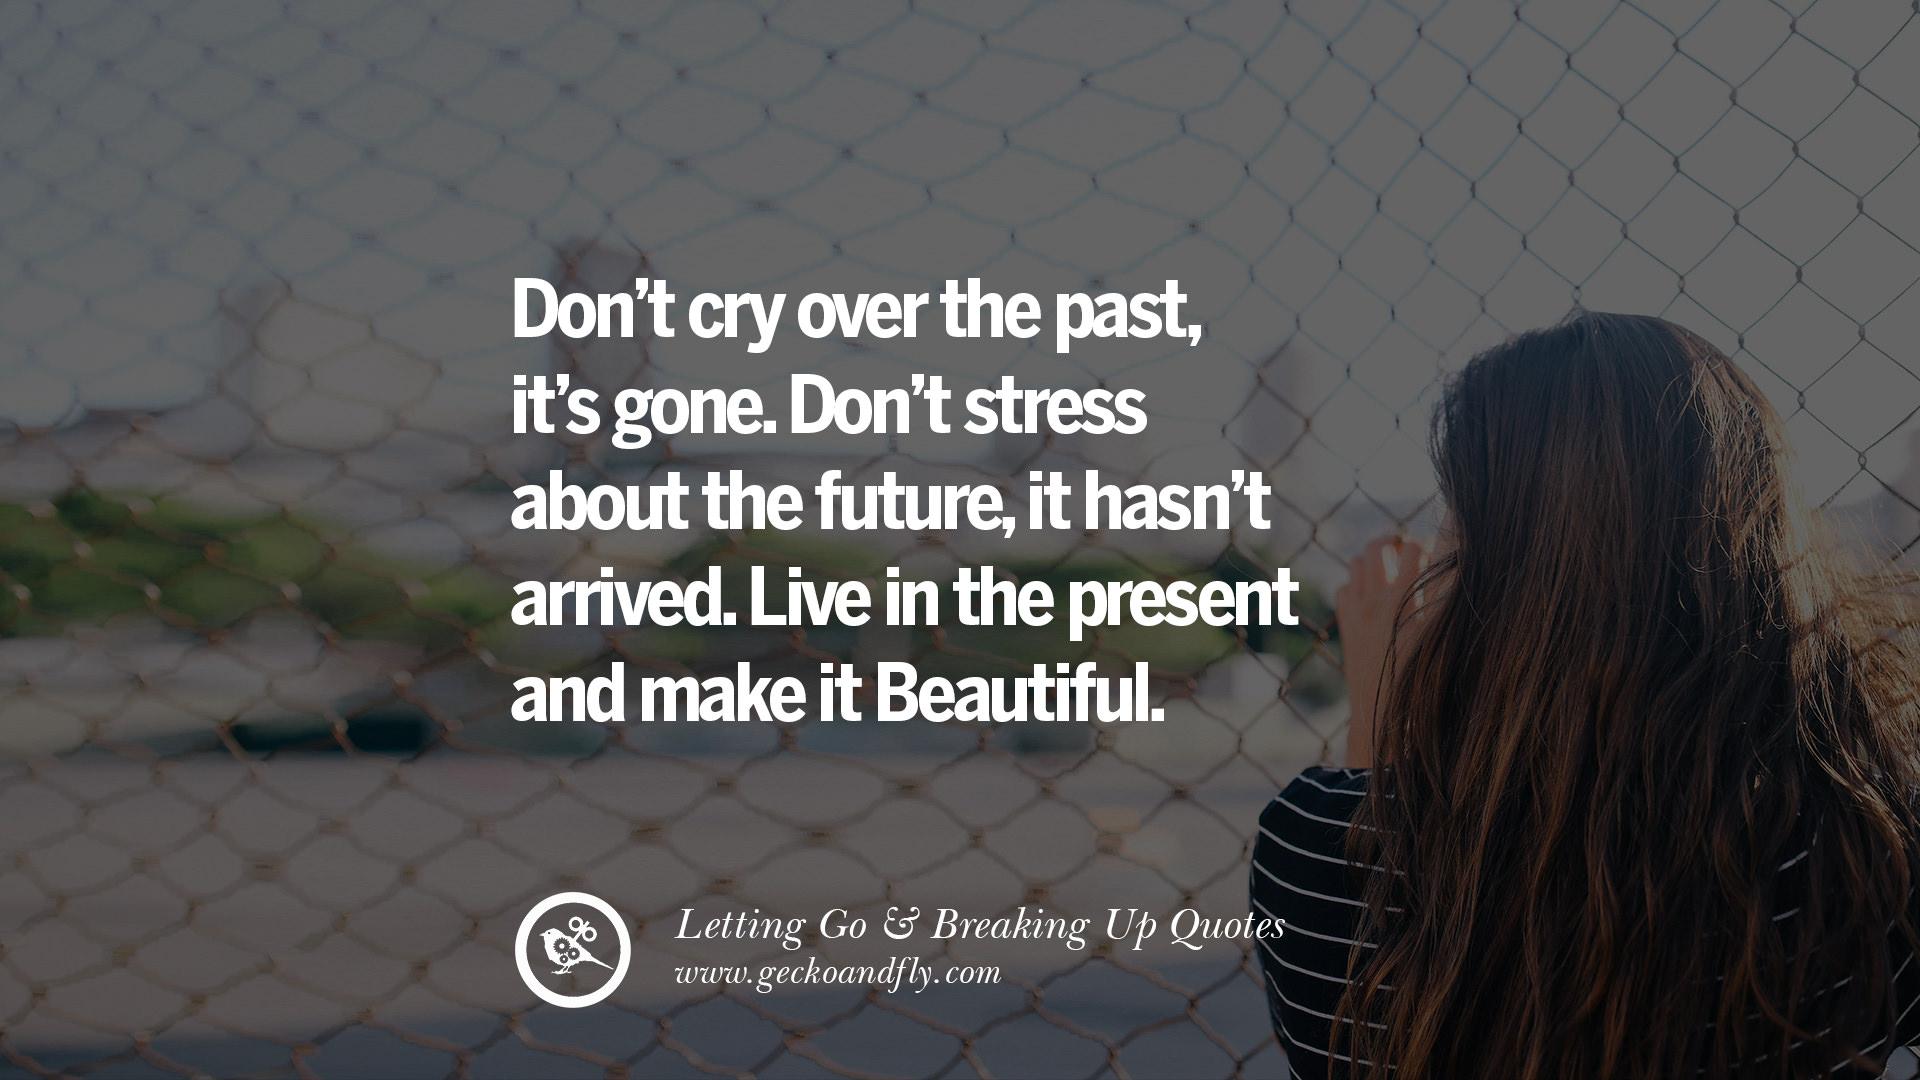 Letting go quotes tumblr